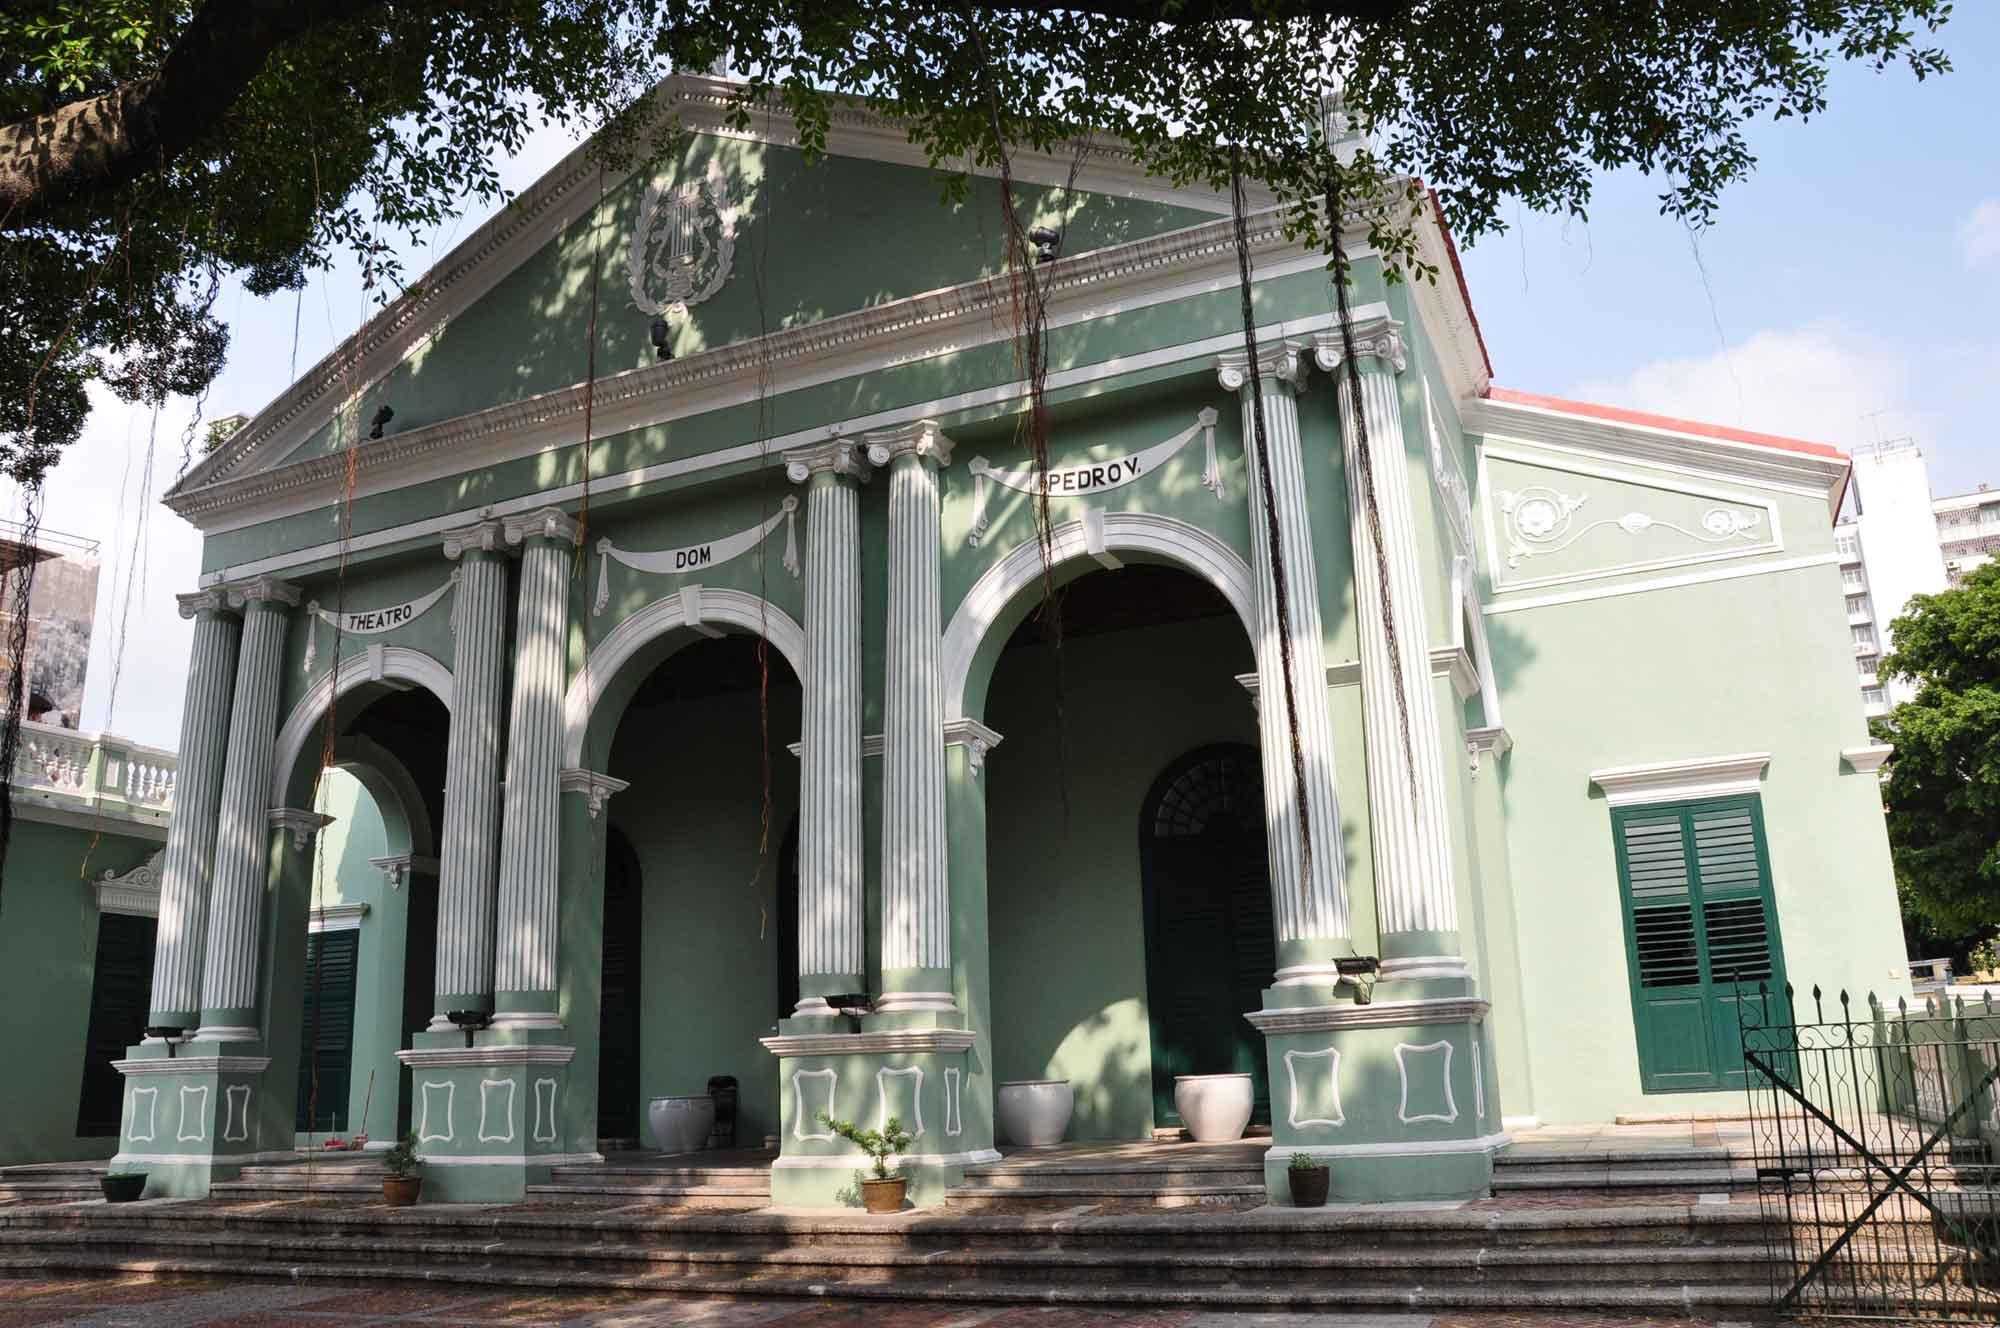 Macau World Heritage Site: Dom Pedro V Theatre